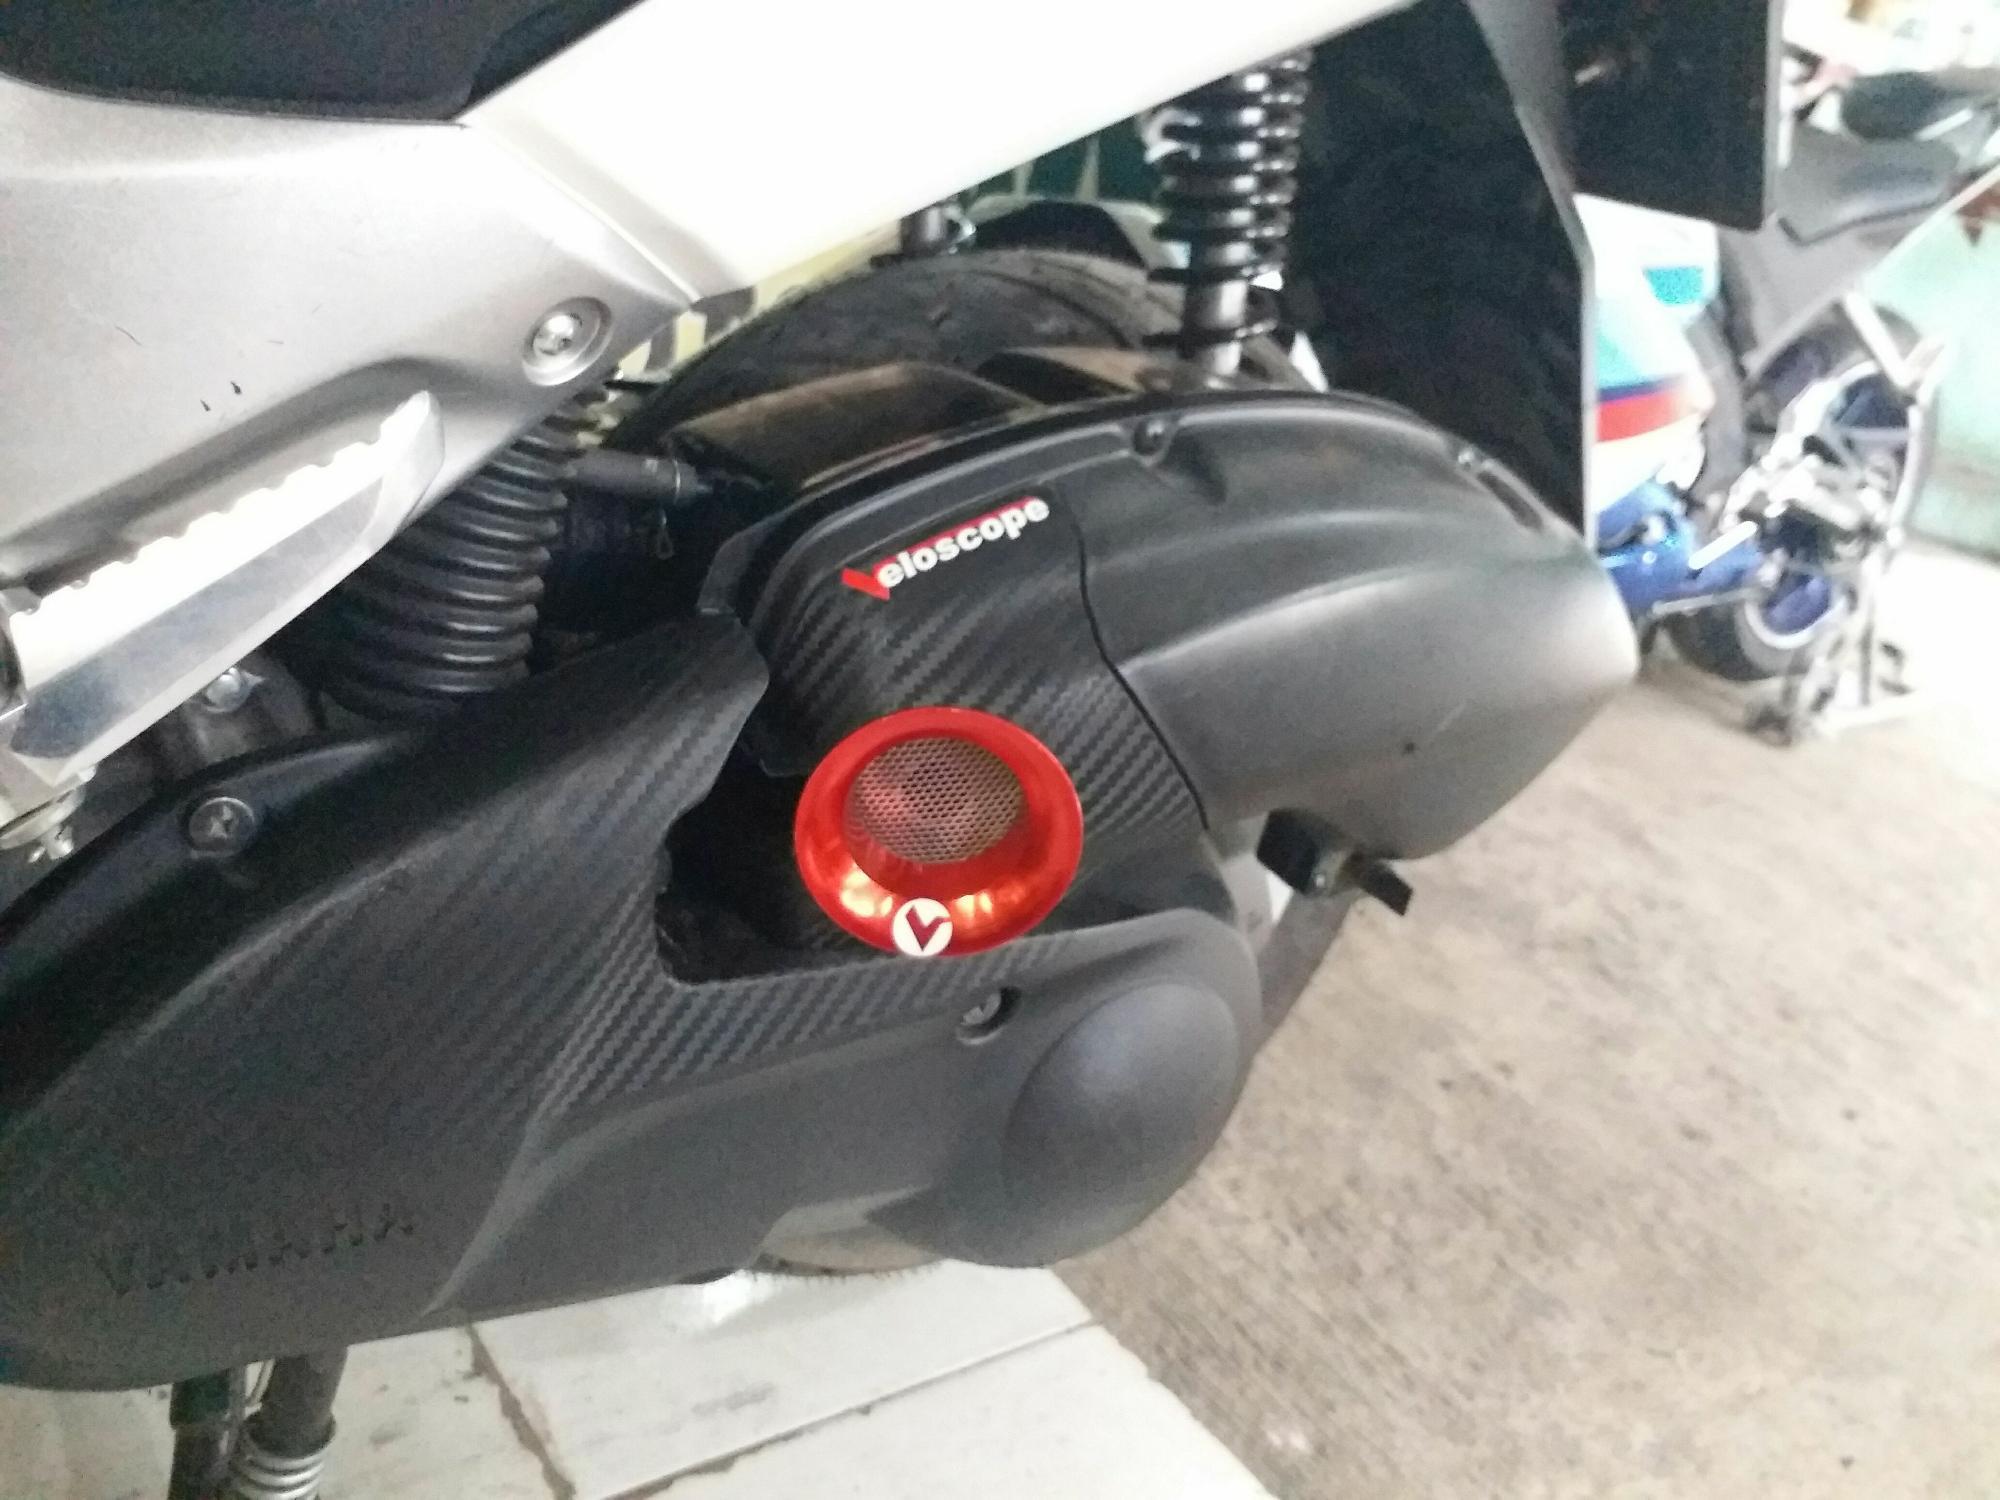 Kelebihan Veloscope Nmax Carbon Original Terkini Daftar Harga Dan Kaos N Max Motor Yamaha Lengan Panjang 3 2